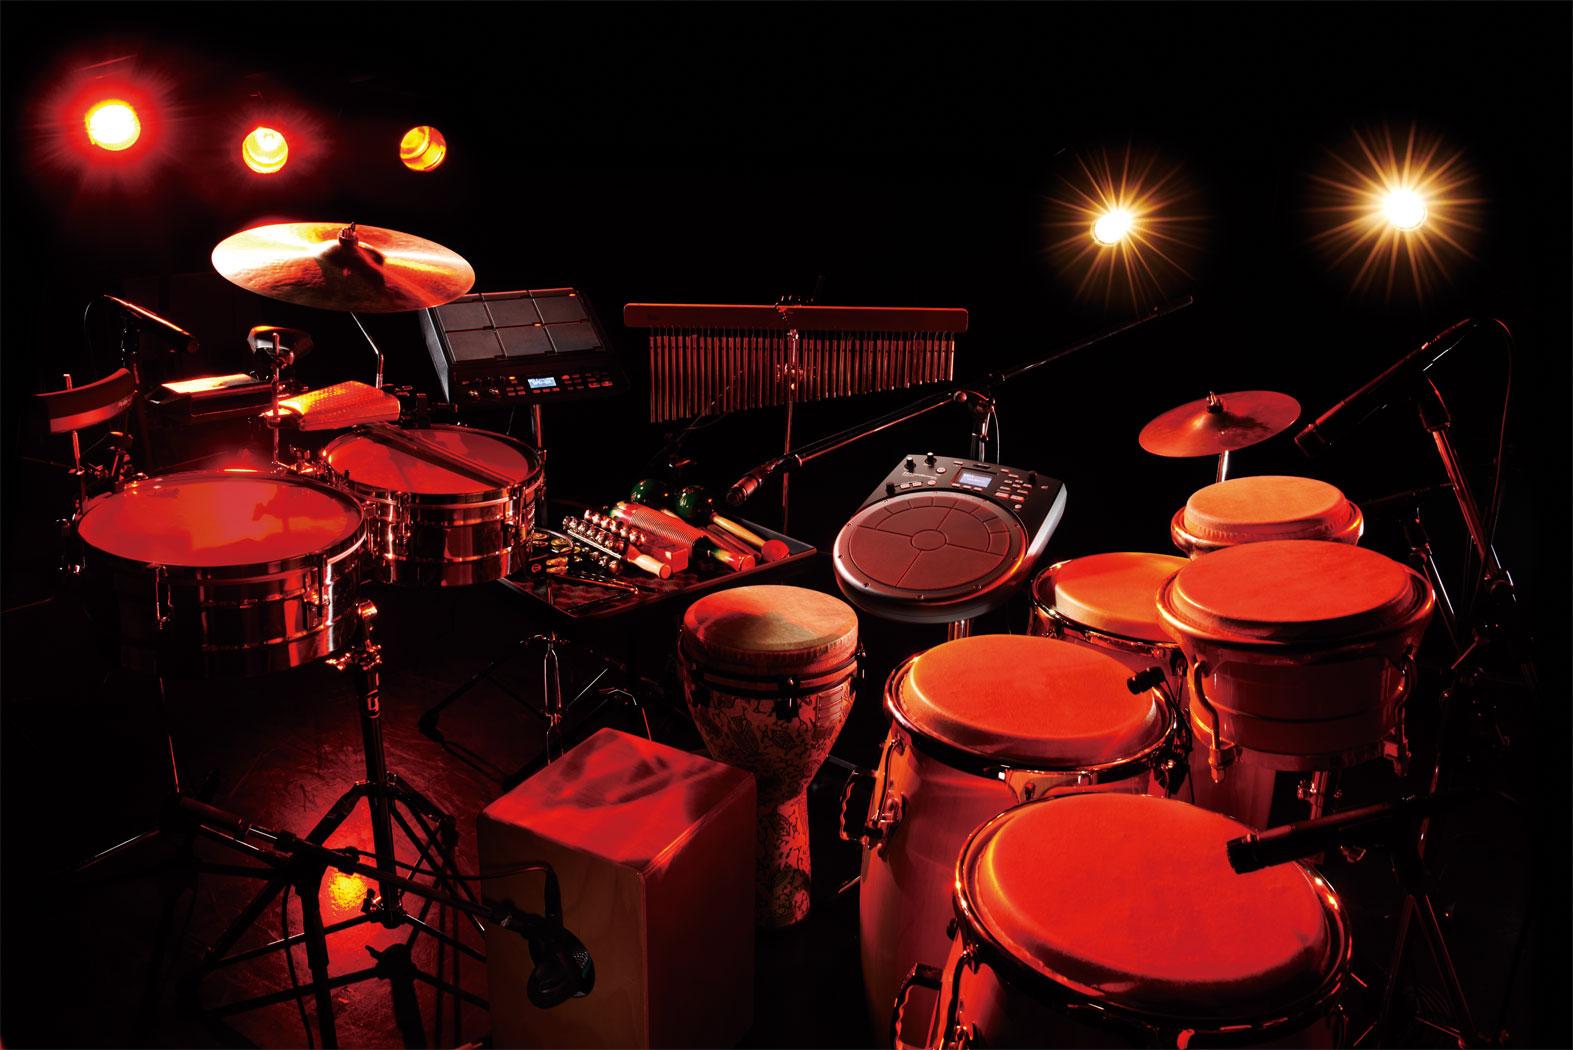 Roland - HandSonic HPD-20   Digital Hand Percussion